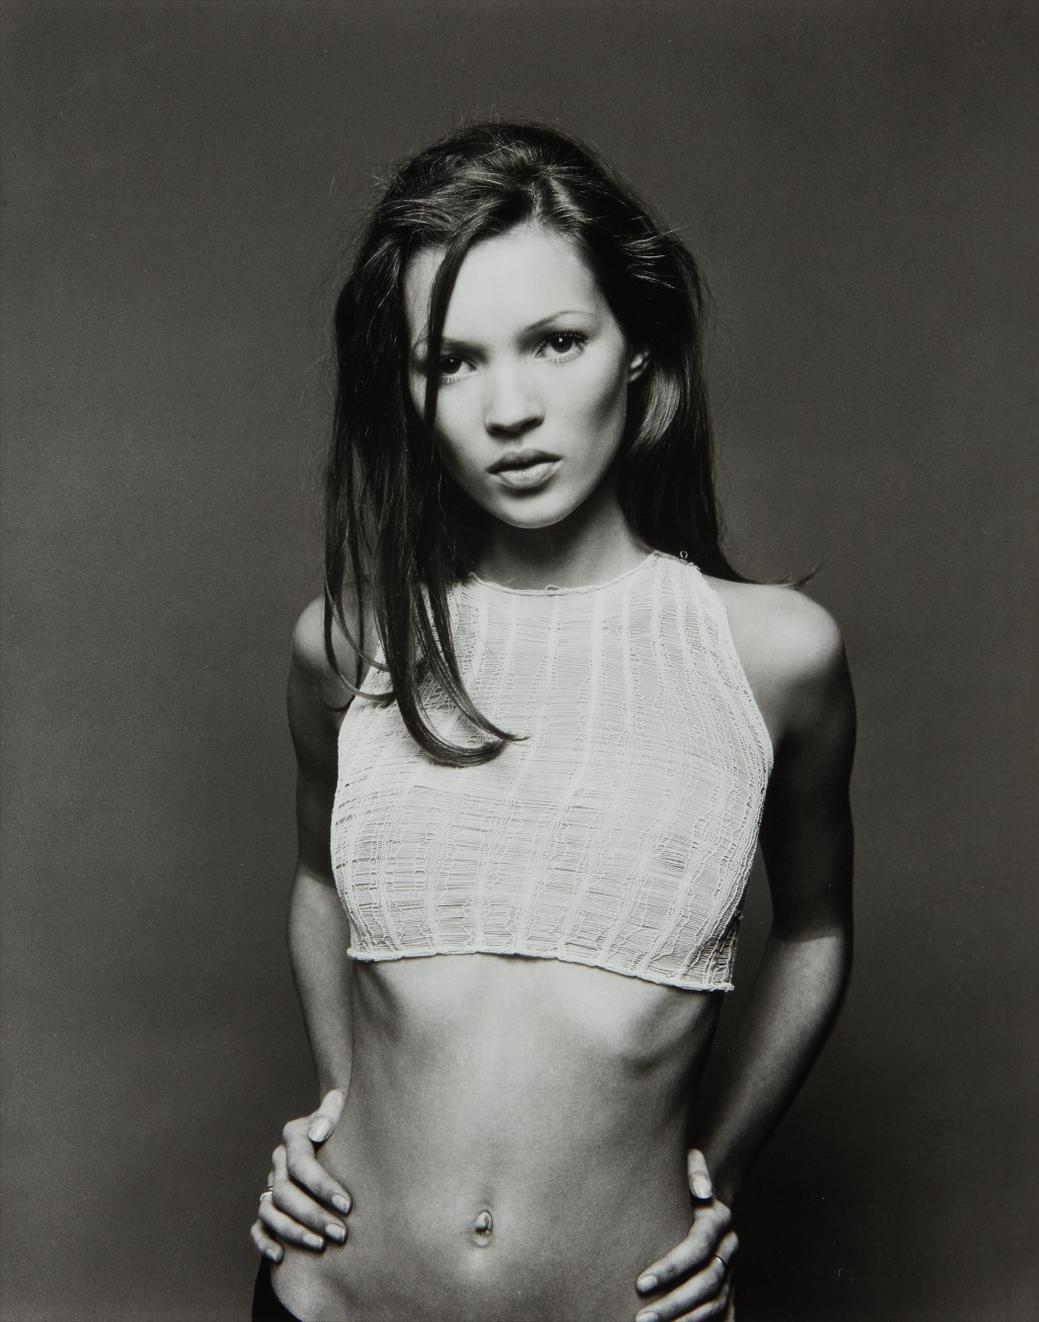 Sante D'Orazio-Kate Moss, West Village, Nyc-1992